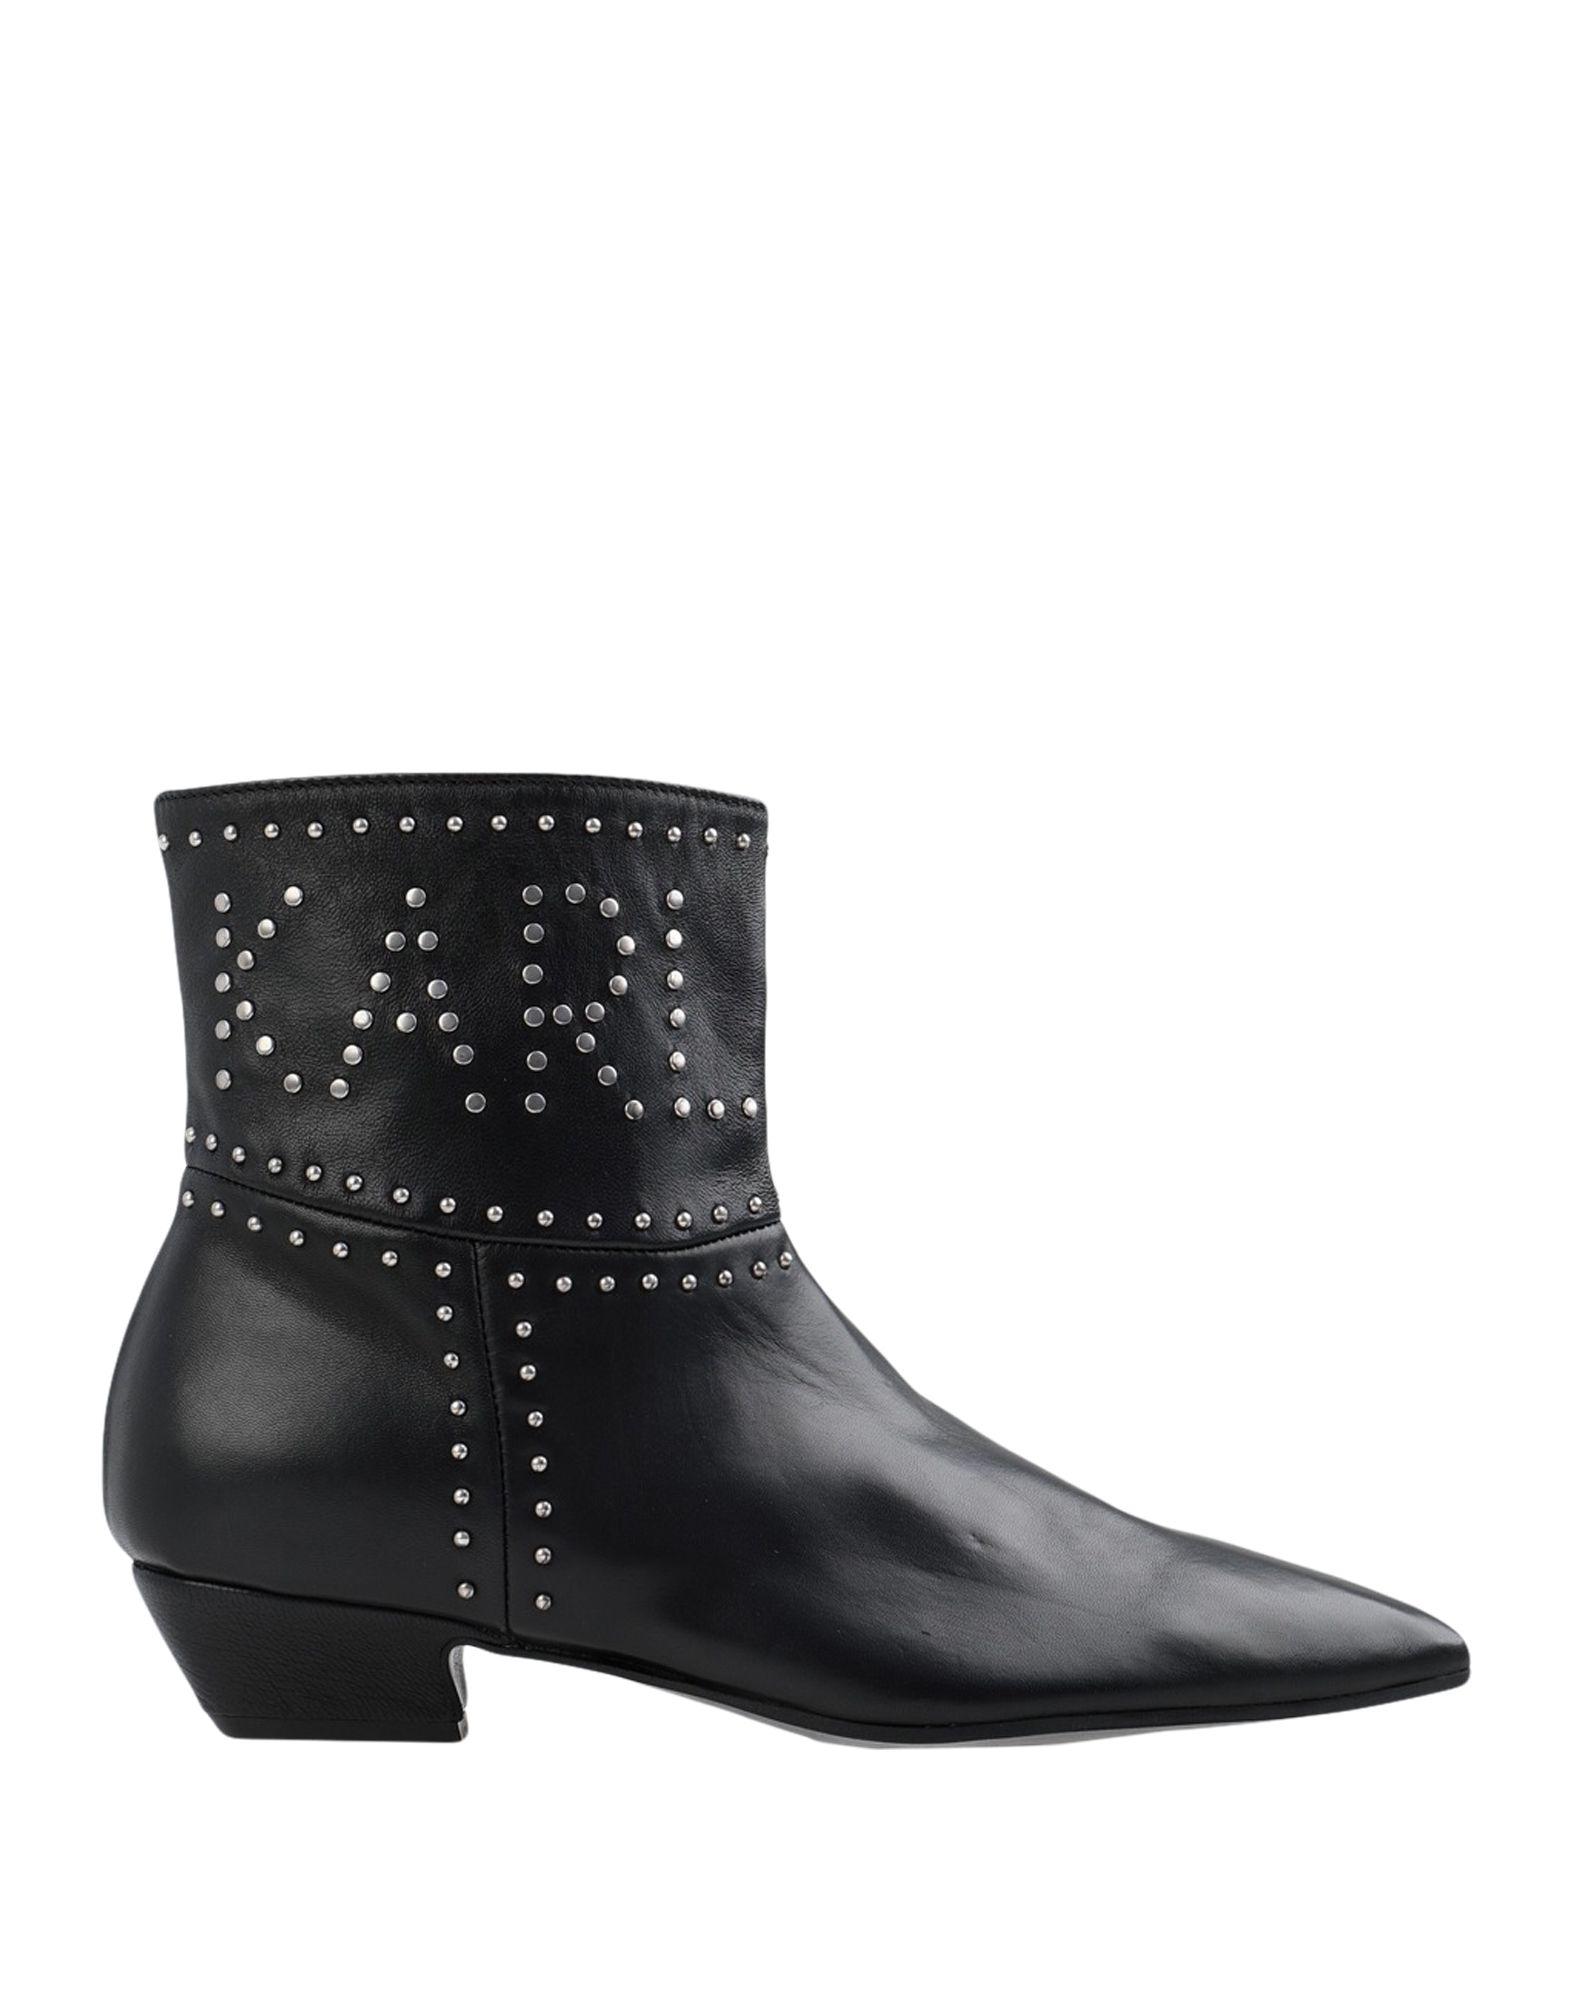 KARL LAGERFELD Полусапоги и высокие ботинки hogan by karl lagerfeld полусапоги и высокие ботинки